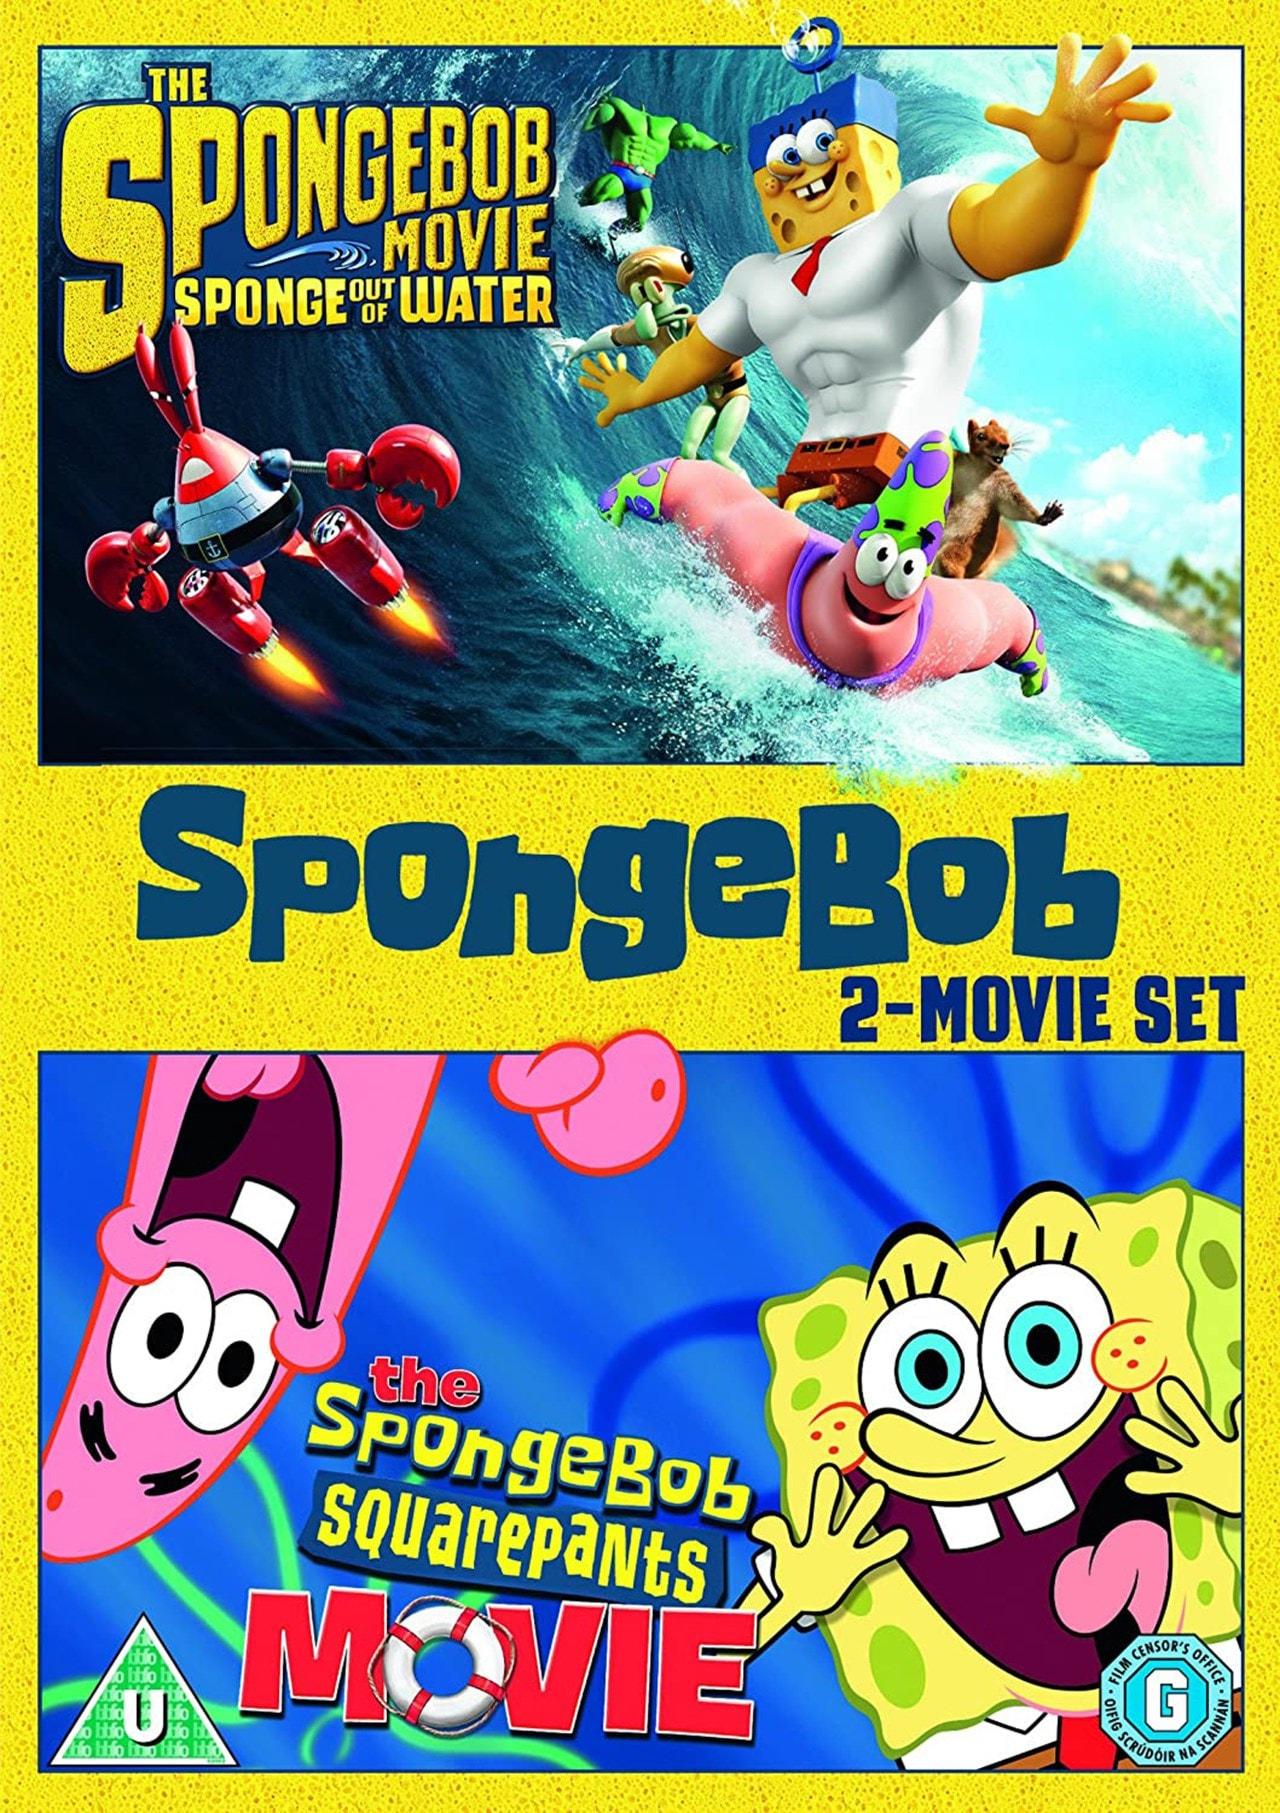 SpongeBob Squarepants: 2-Movie Set - 1